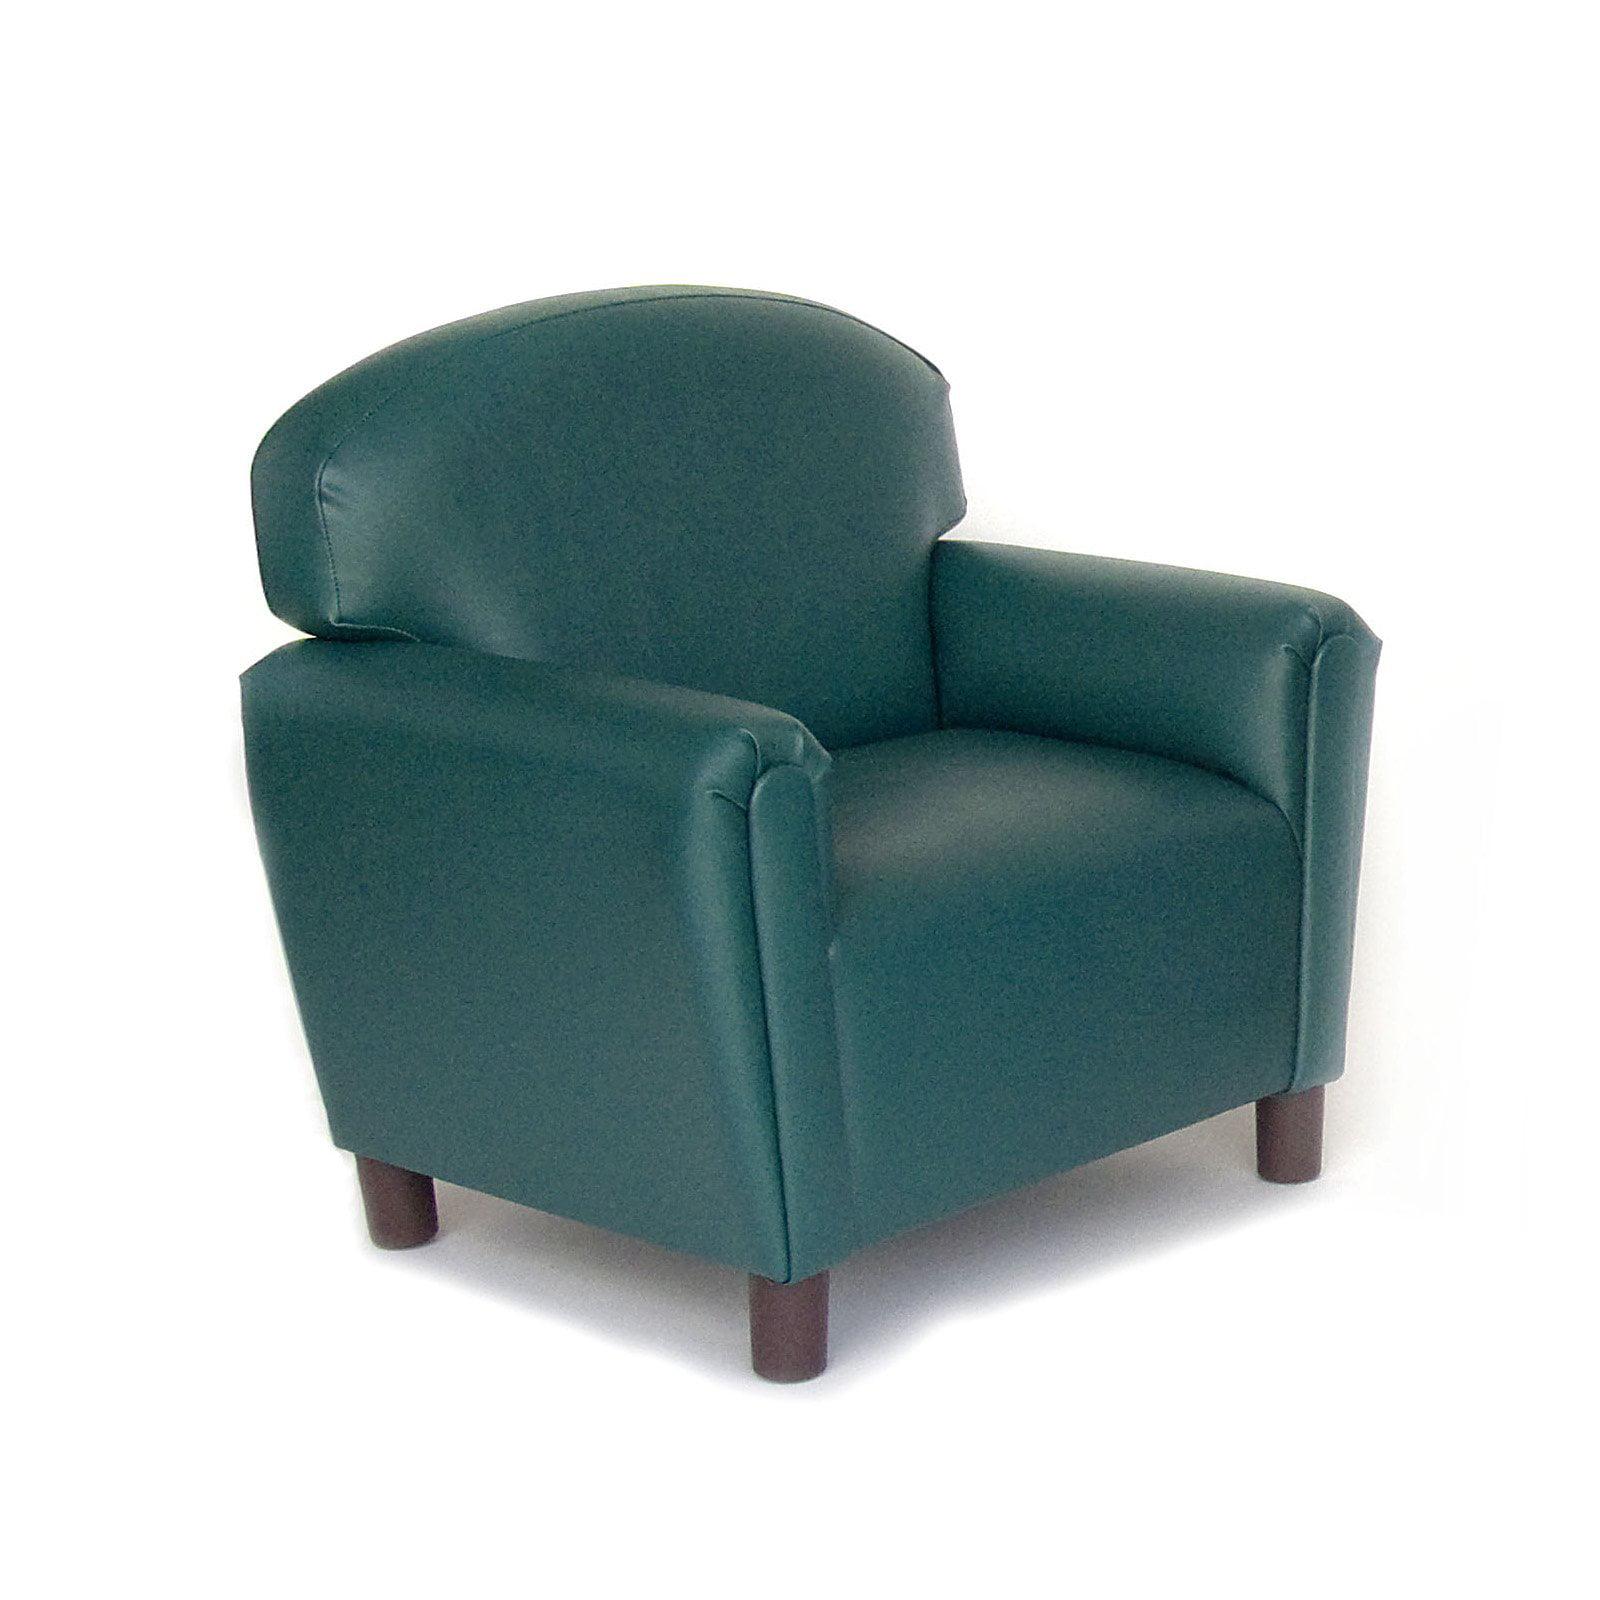 Brand New World Vinyl Upholstered Preschool Sofa by Brand New World